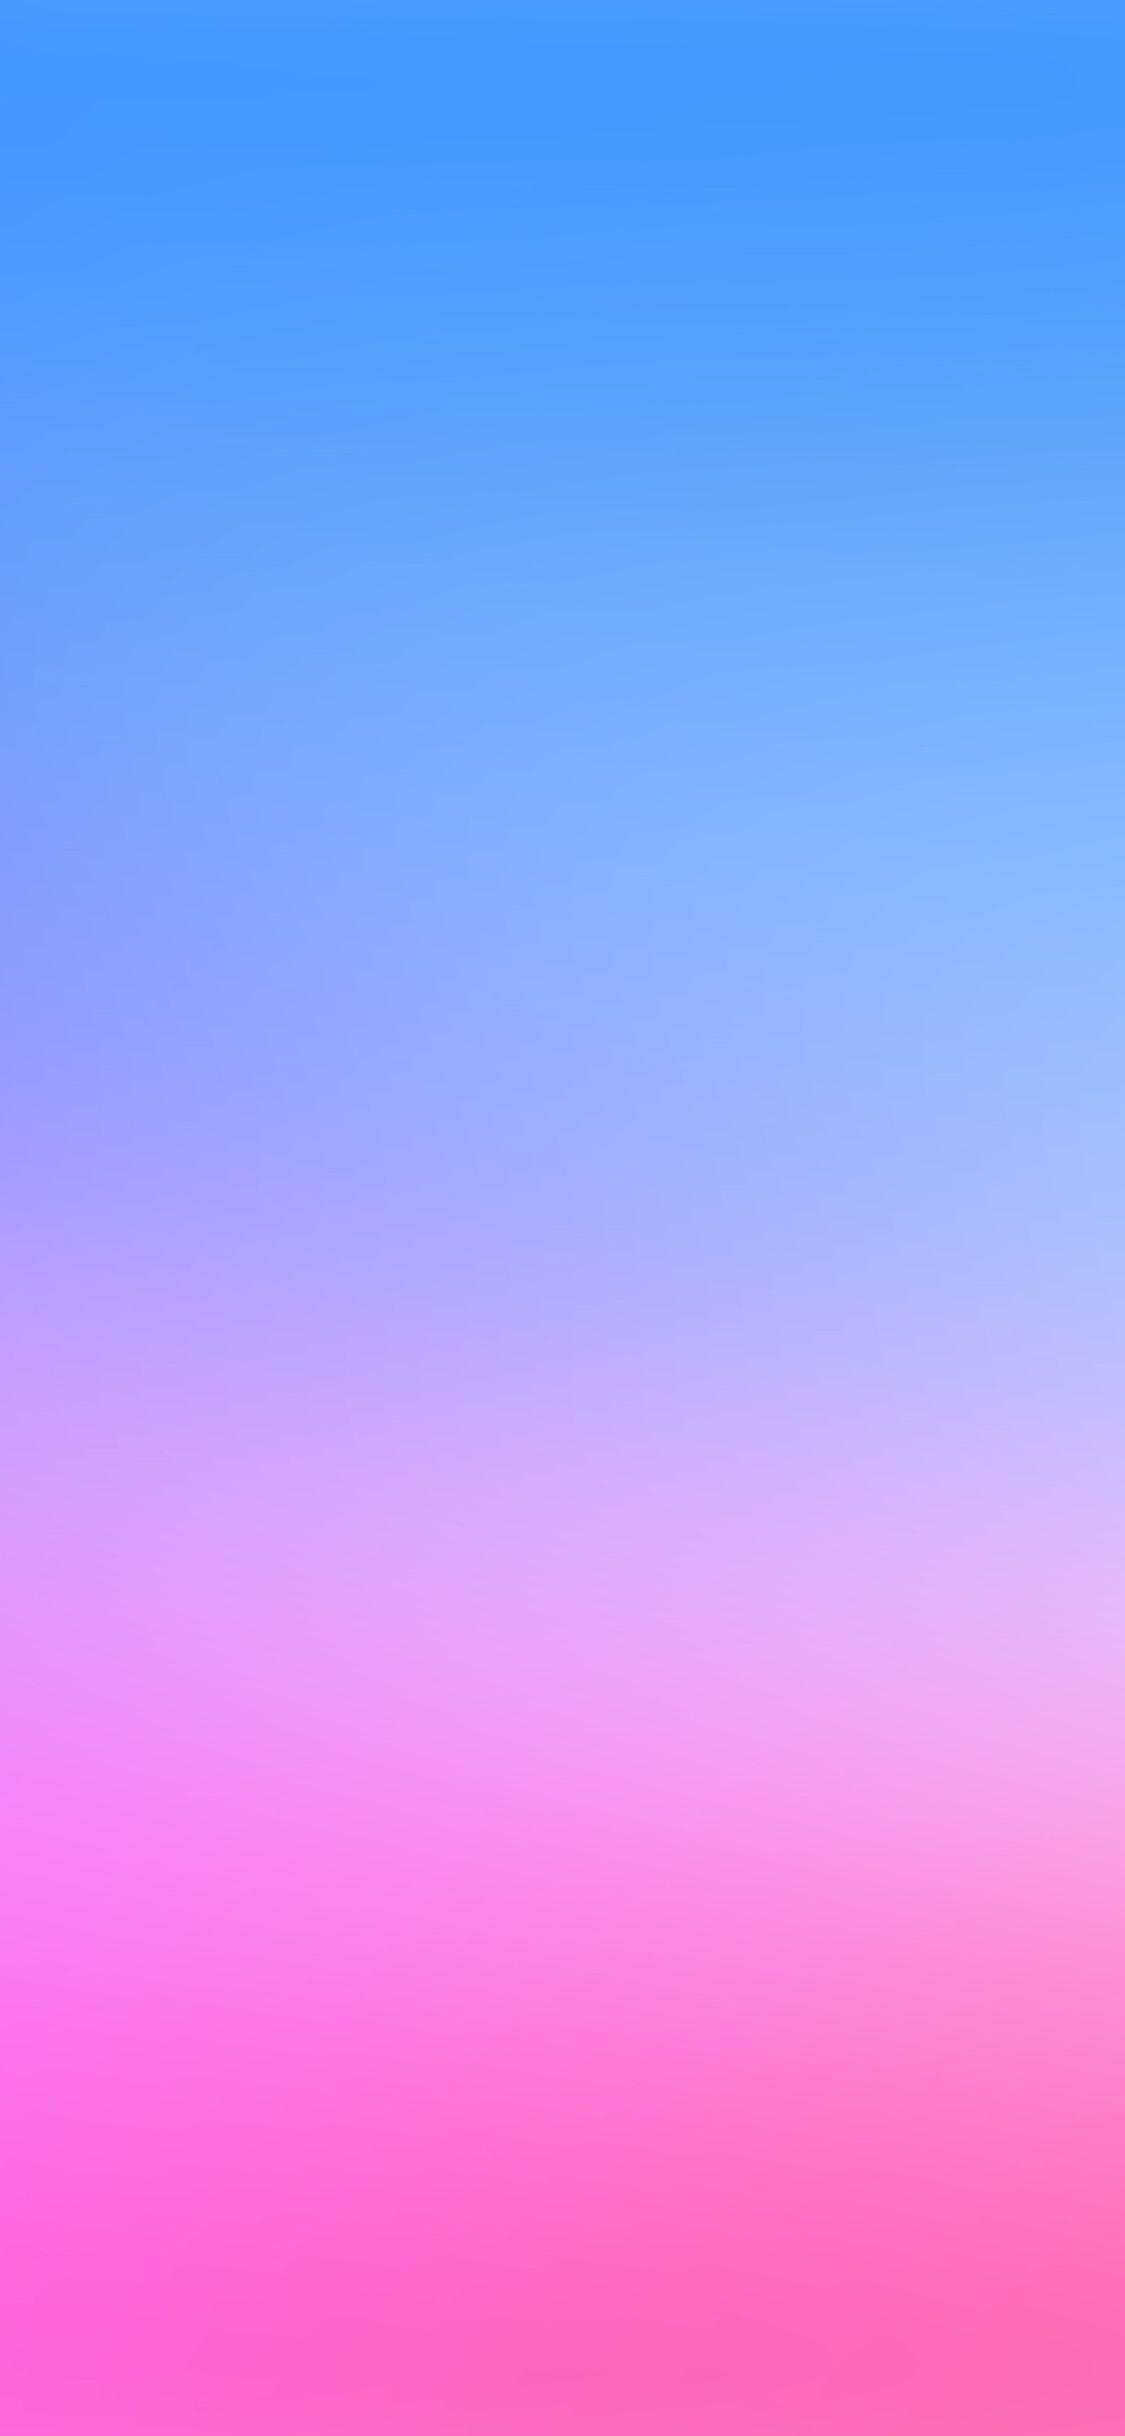 Iphonexpapers Com Apple Iphone Wallpaper Sl66 Pink Blue Blur Gradation Pink Wallpaper Iphone Summer Wallpaper Wallpaper Iphone Summer